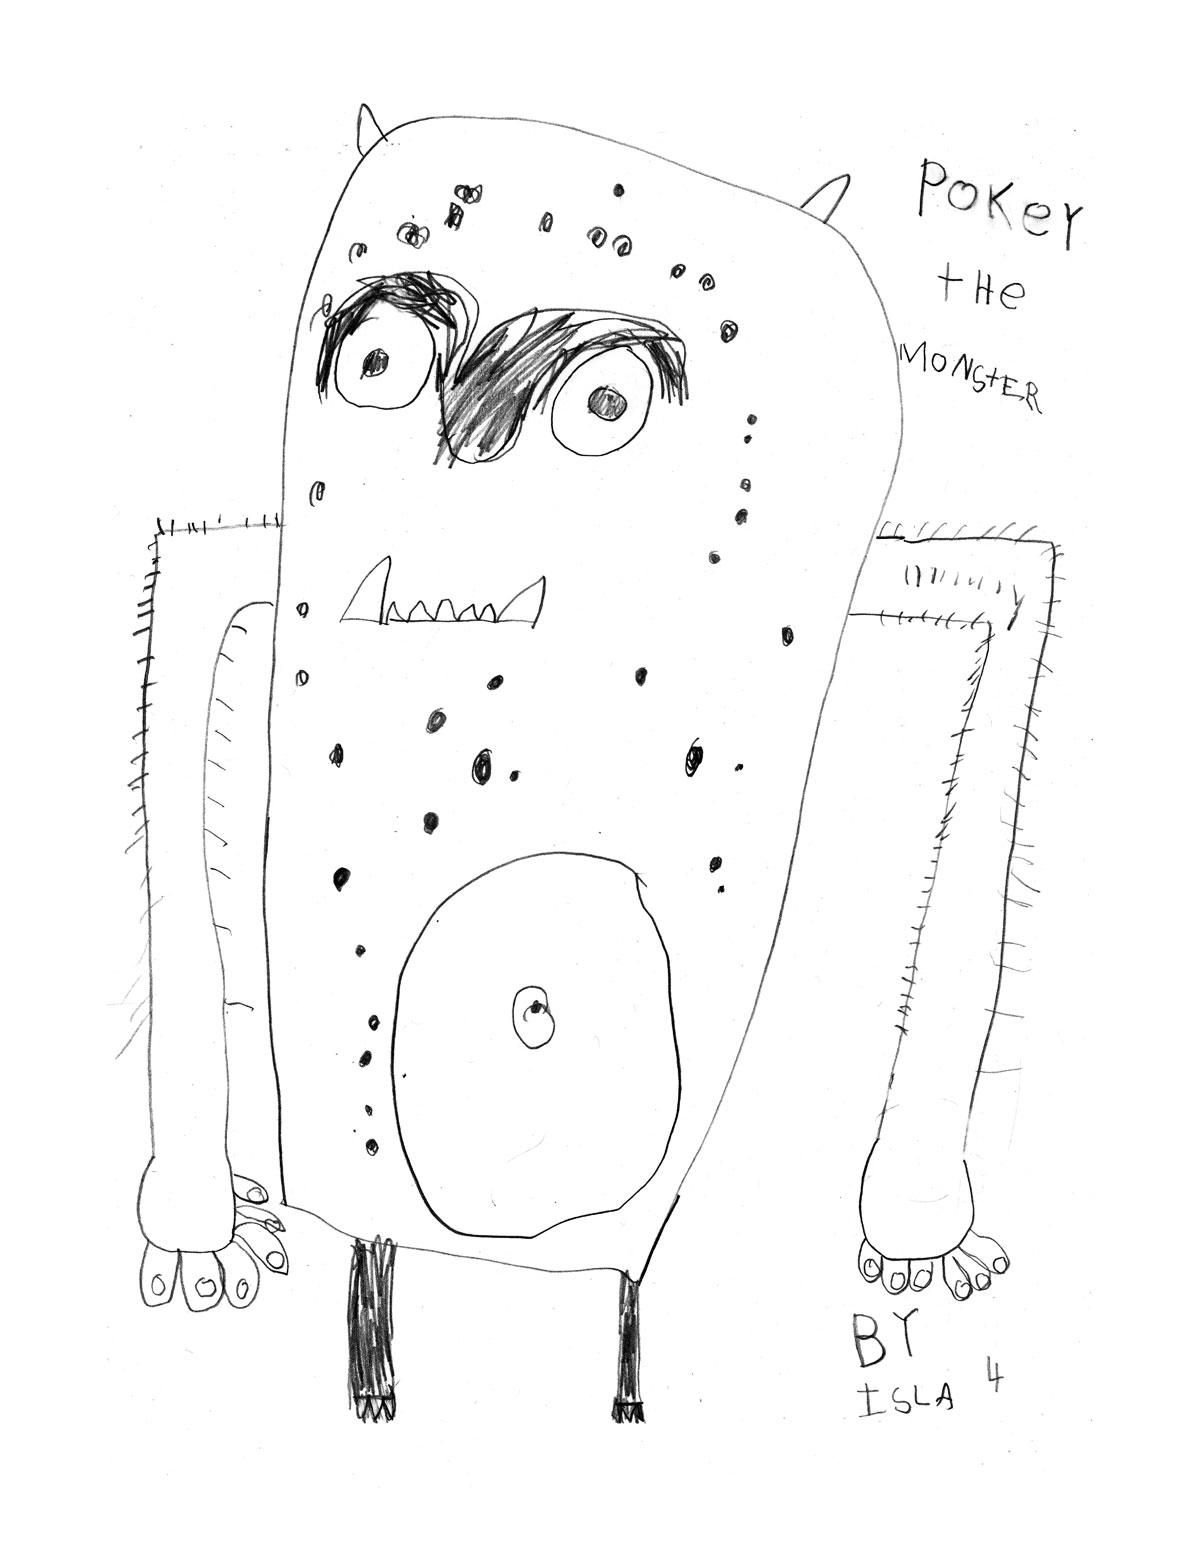 Illustration of monster by Isla.